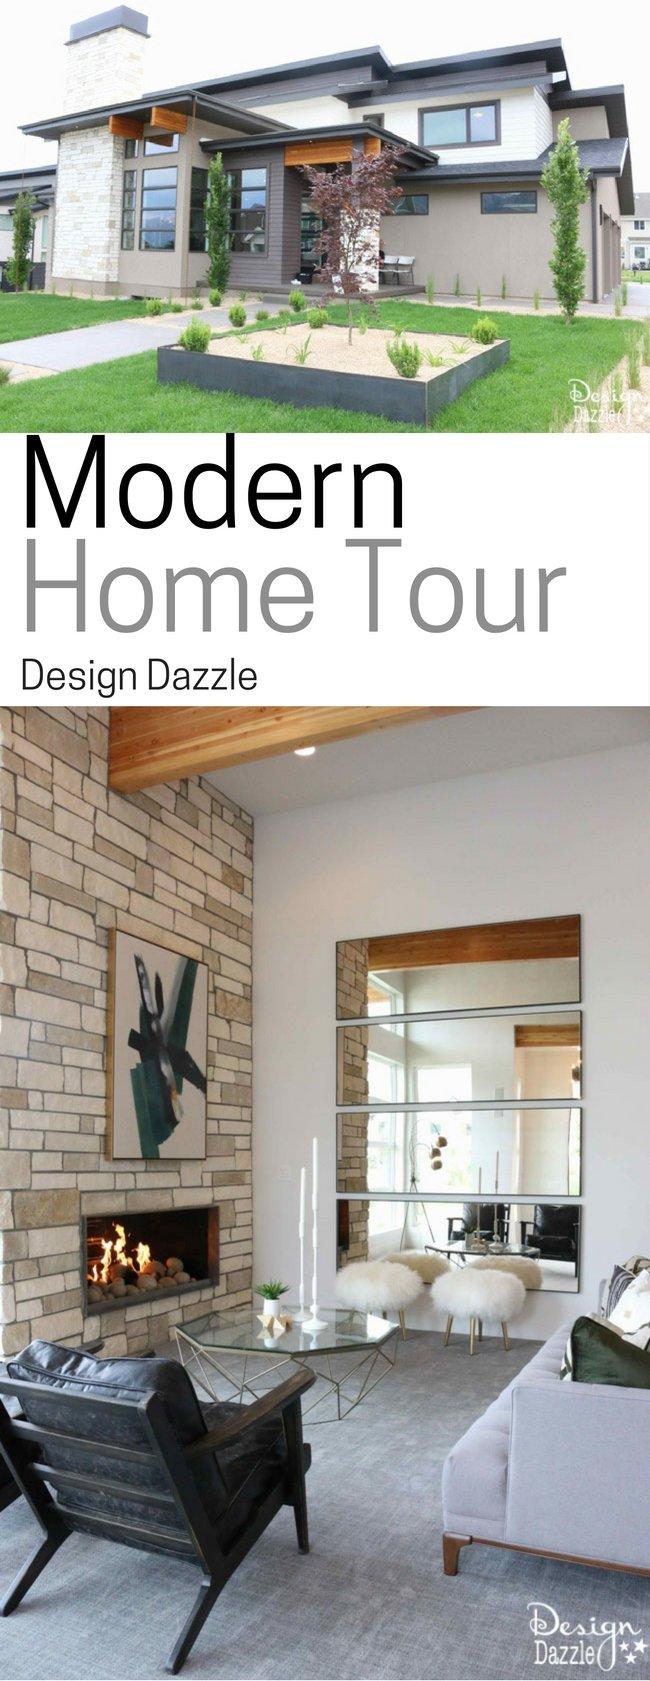 Modern Home Tour Design Dazzle